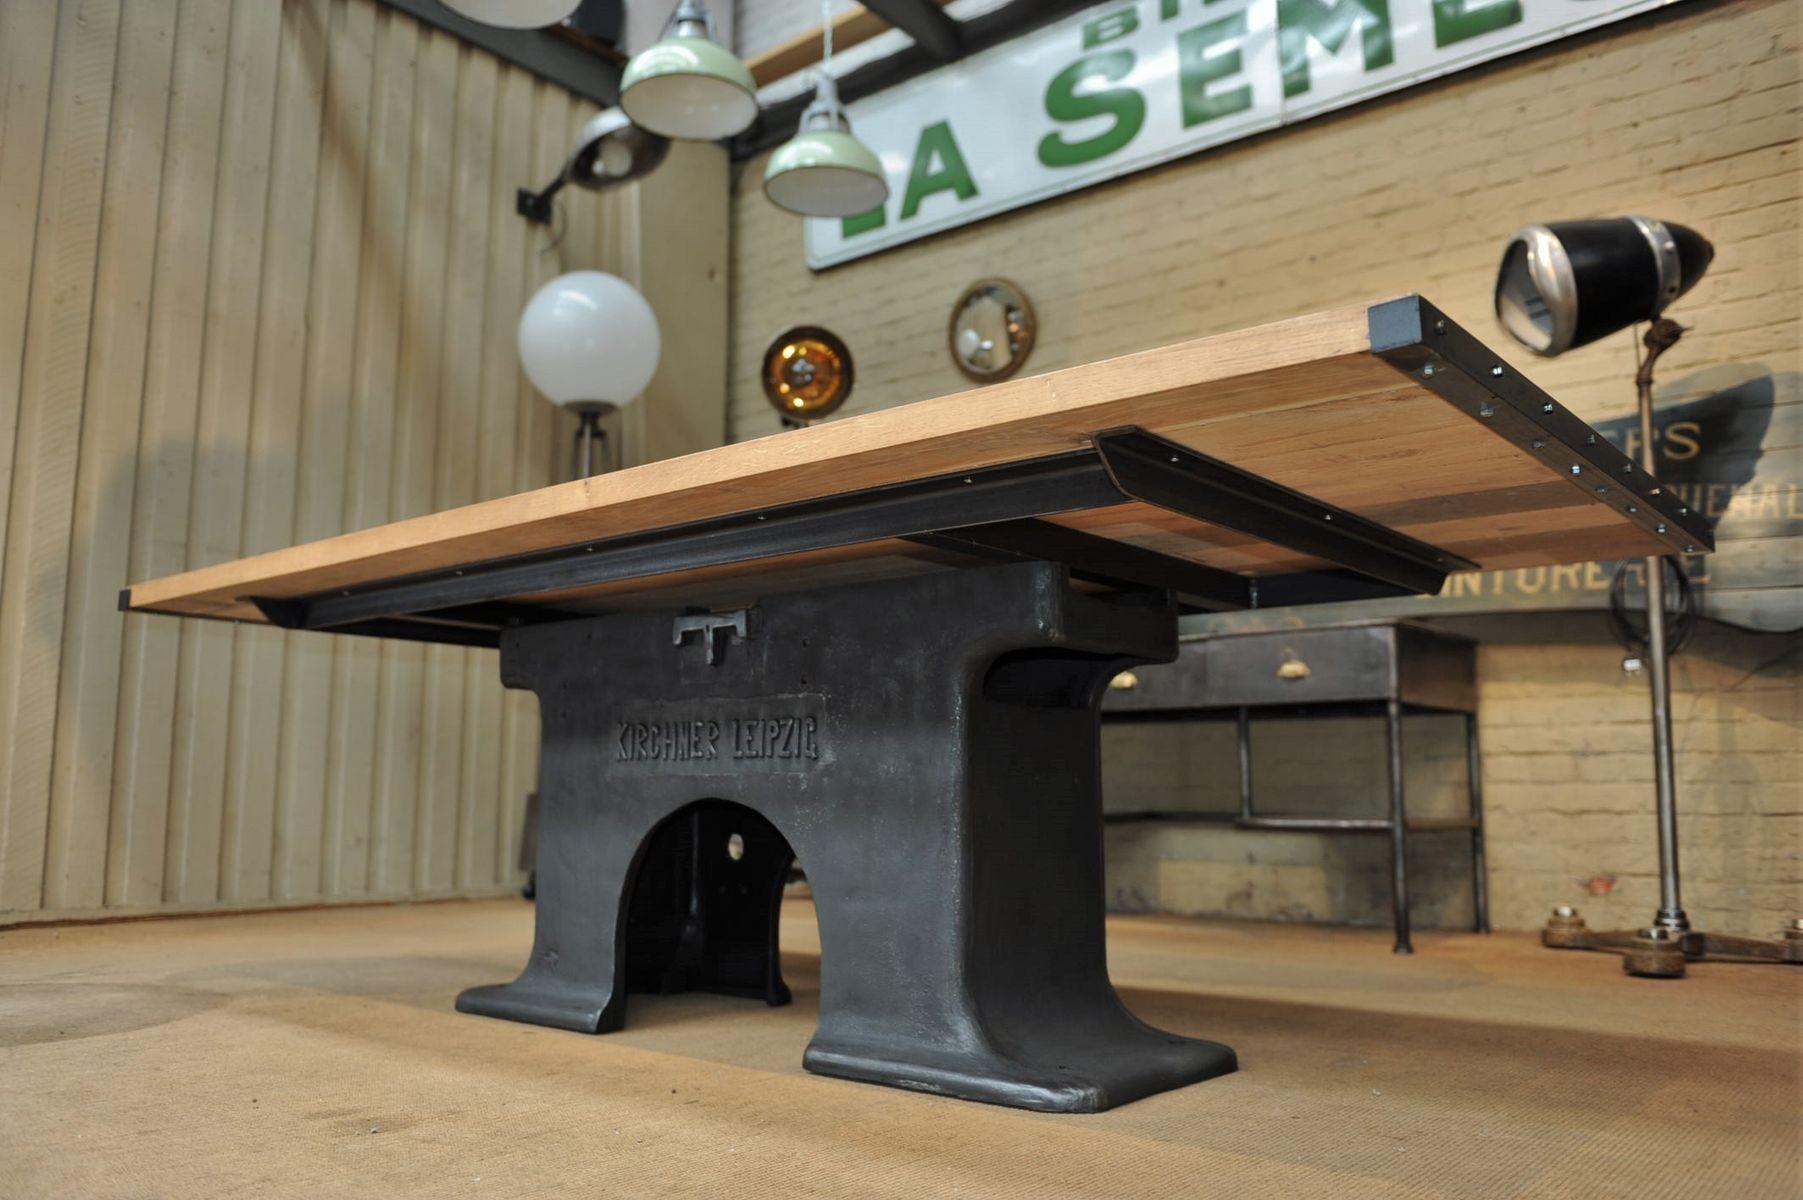 Table de salle manger industrielle en fer forg ch ne allemagne 190 - Fer forge en anglais ...